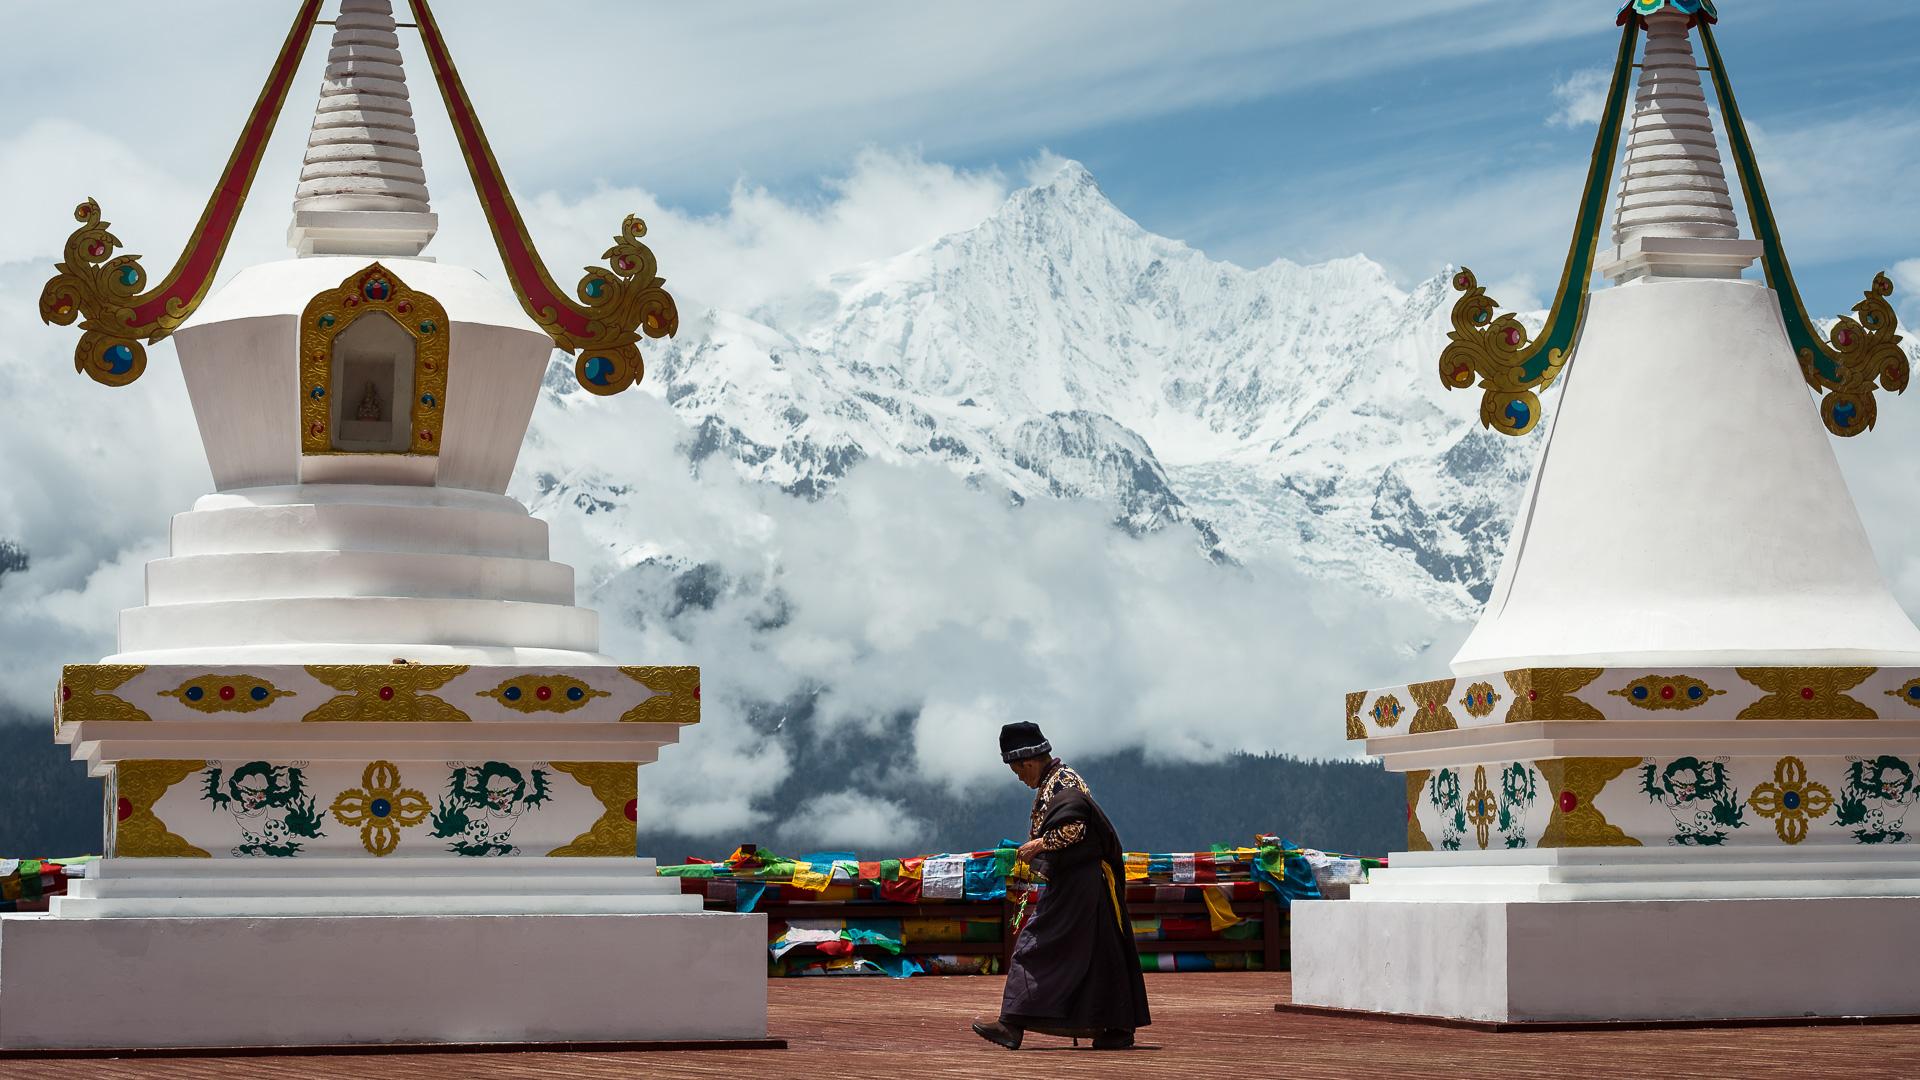 A Tibetan man prayer walks around stupas